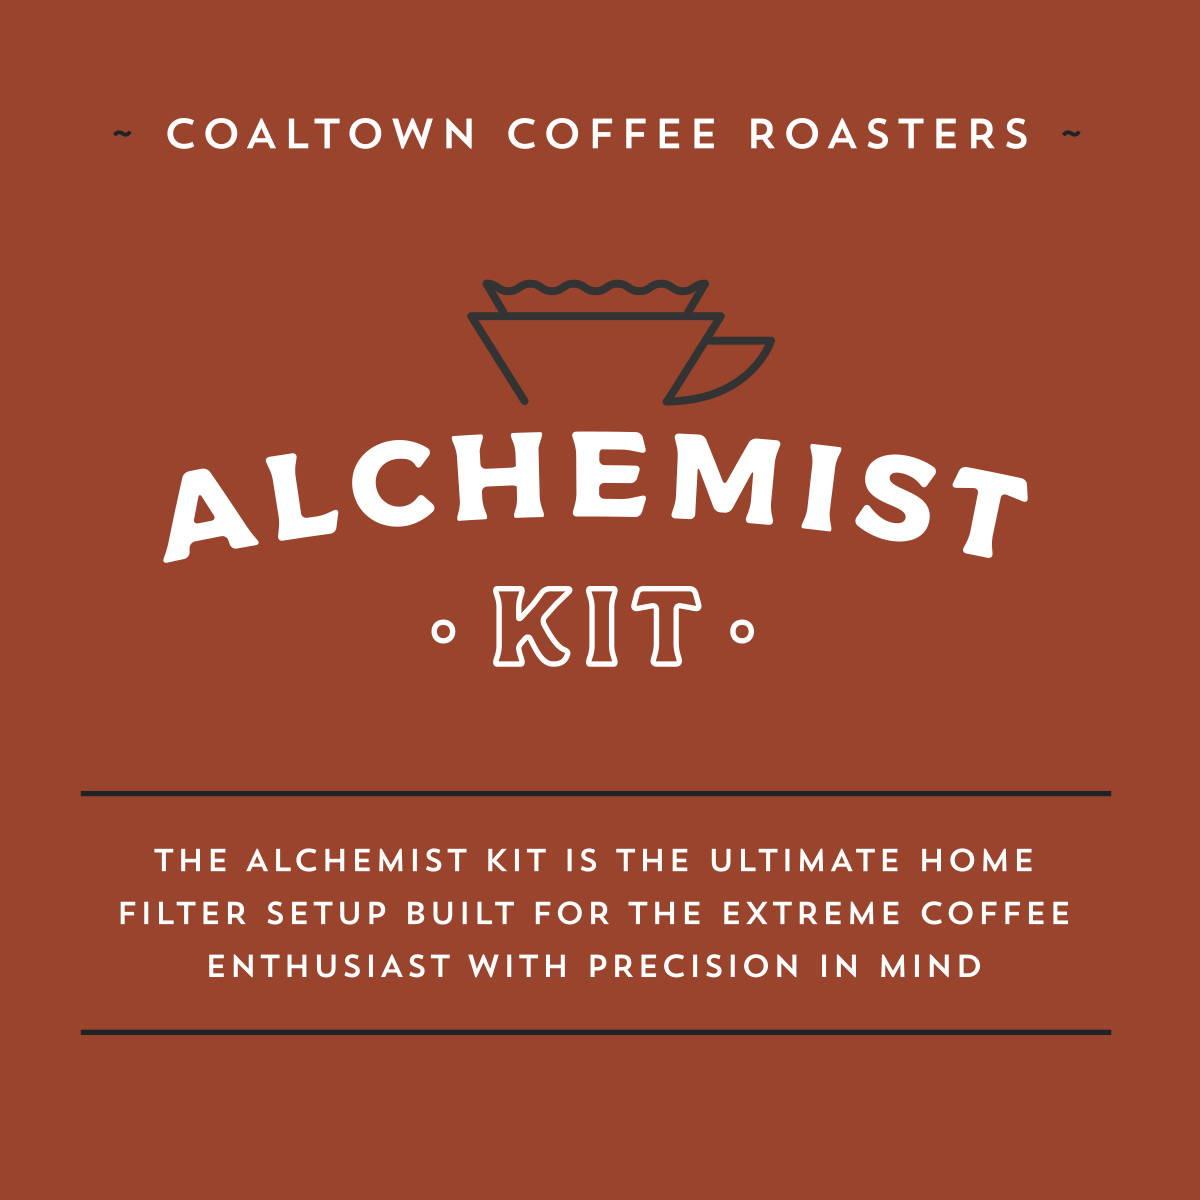 Alchemist Kit